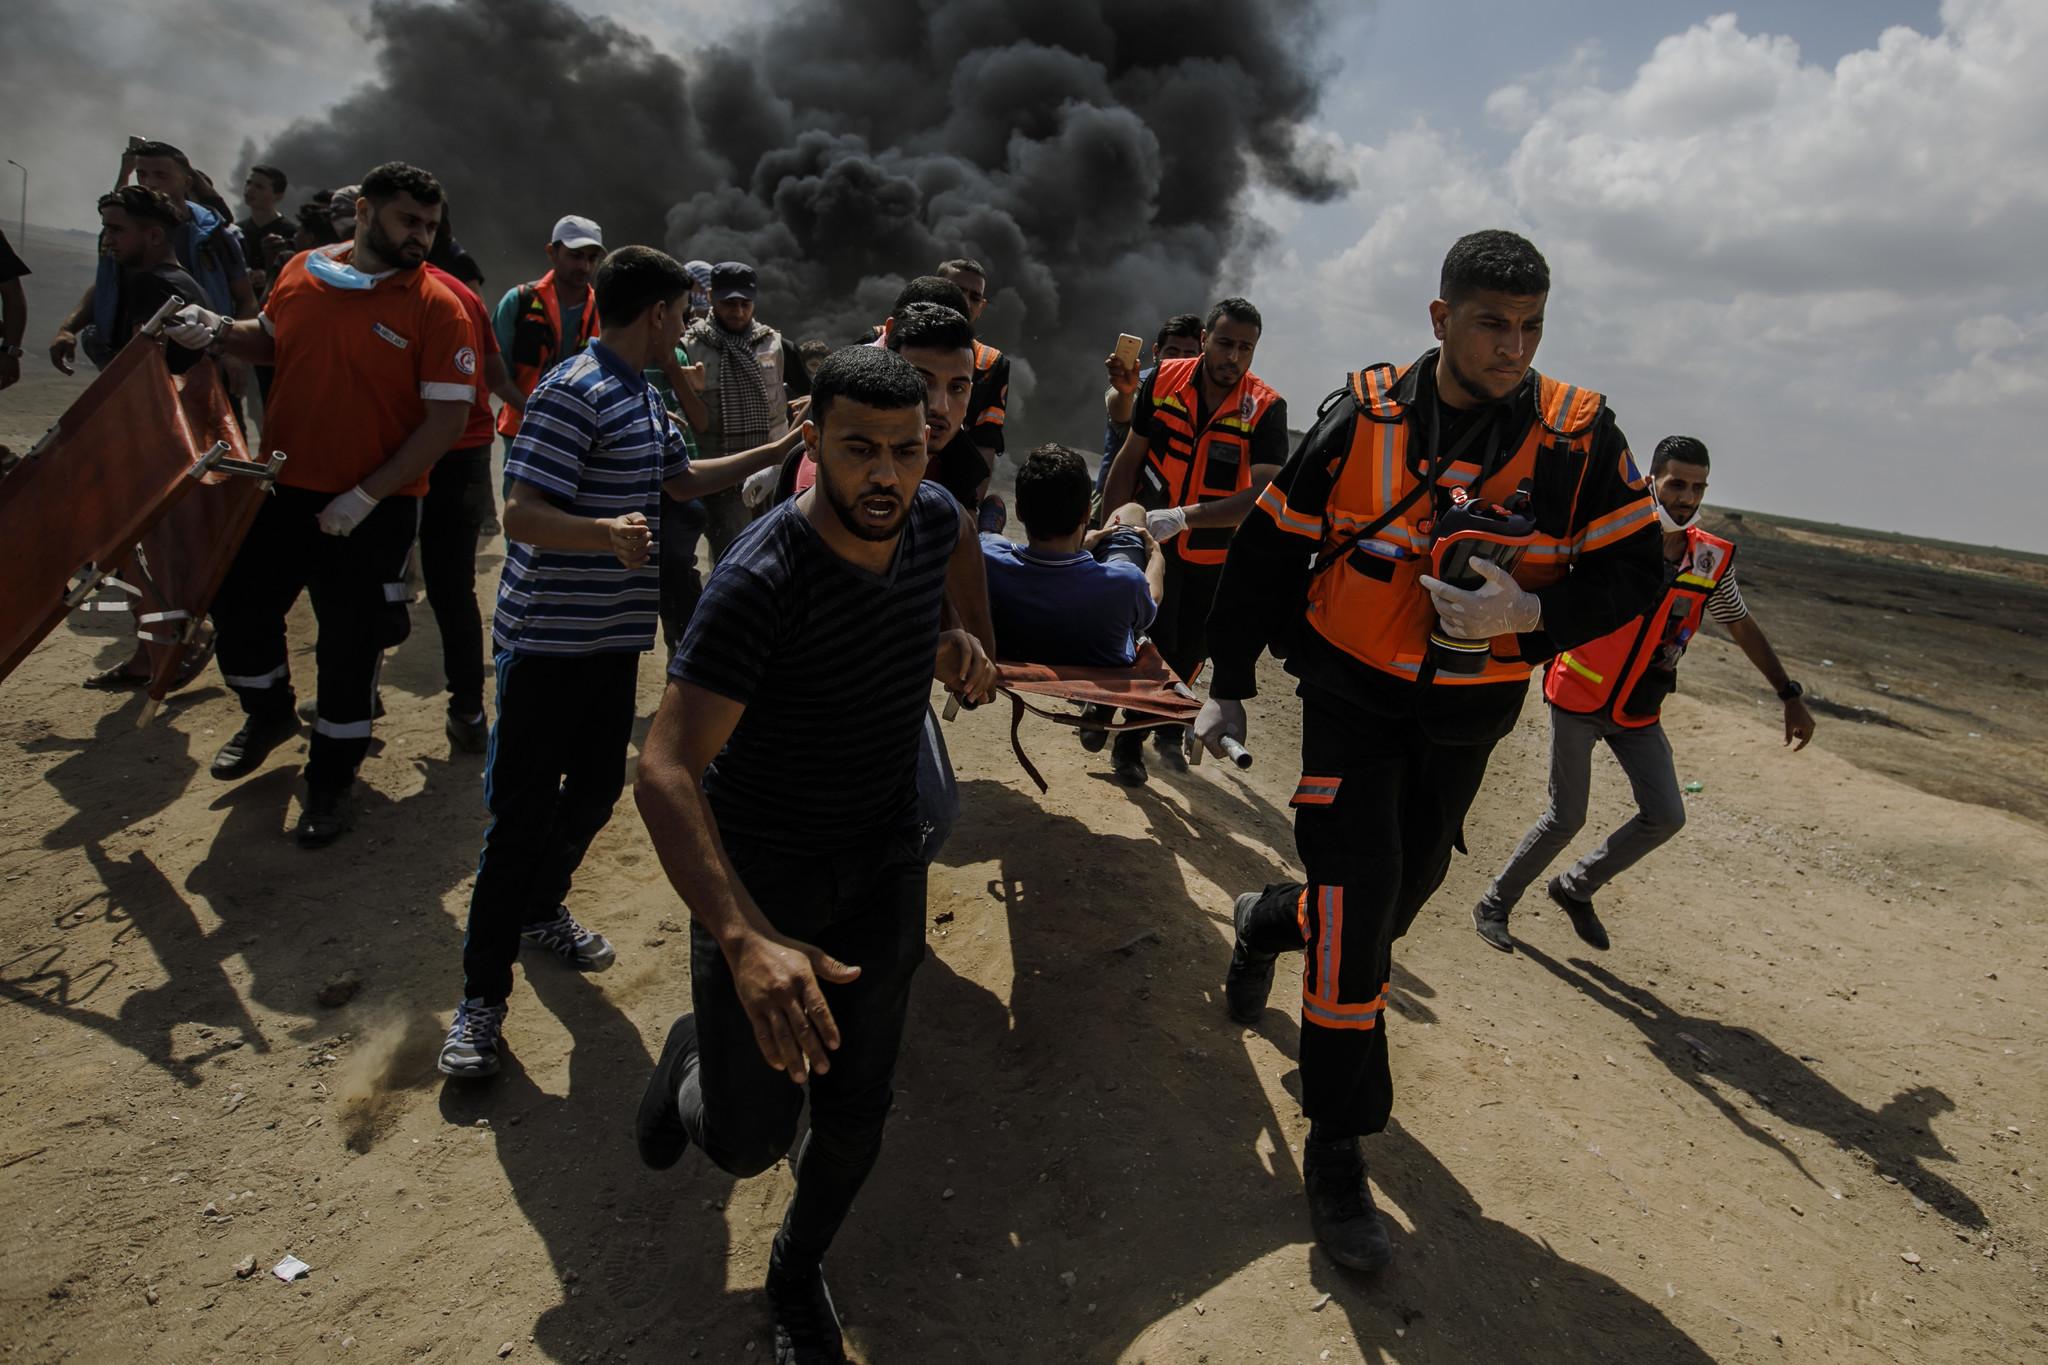 GAZA CITY, GAZA — MONDAY, MAY 14, 2018: Medical units carry away a wounded Palestinian shot by Isra